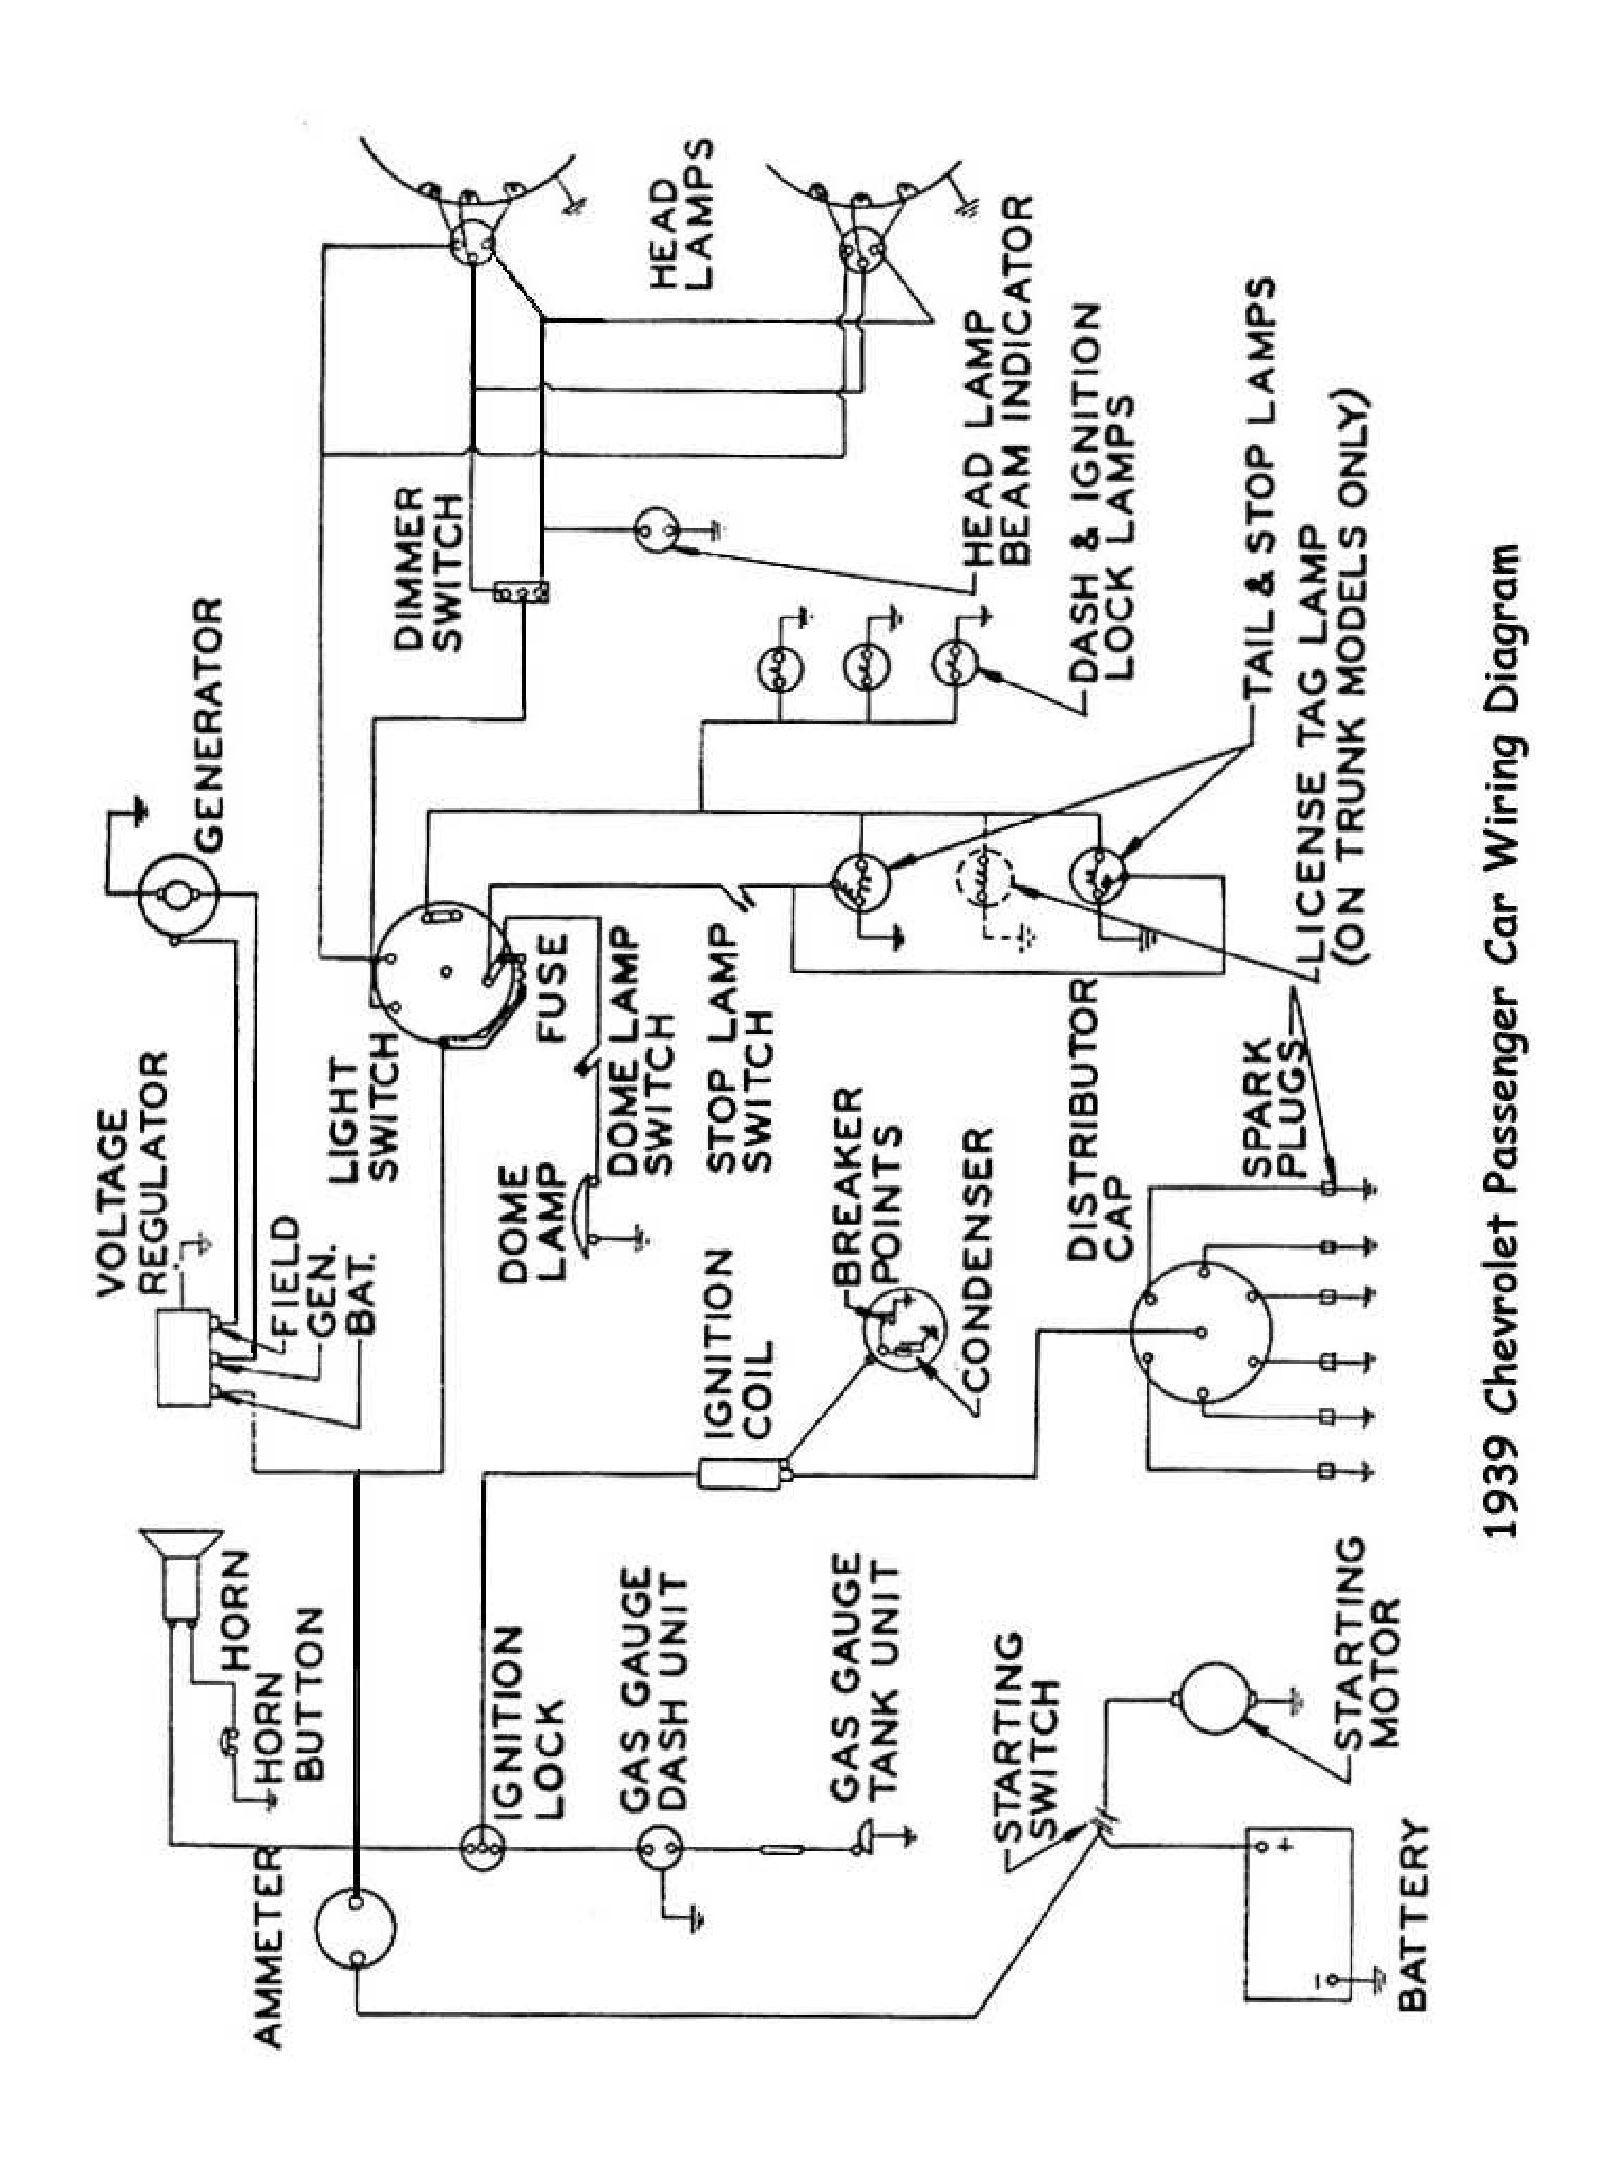 1939 Truck Wiring · 1939 Passenger Car Wiring